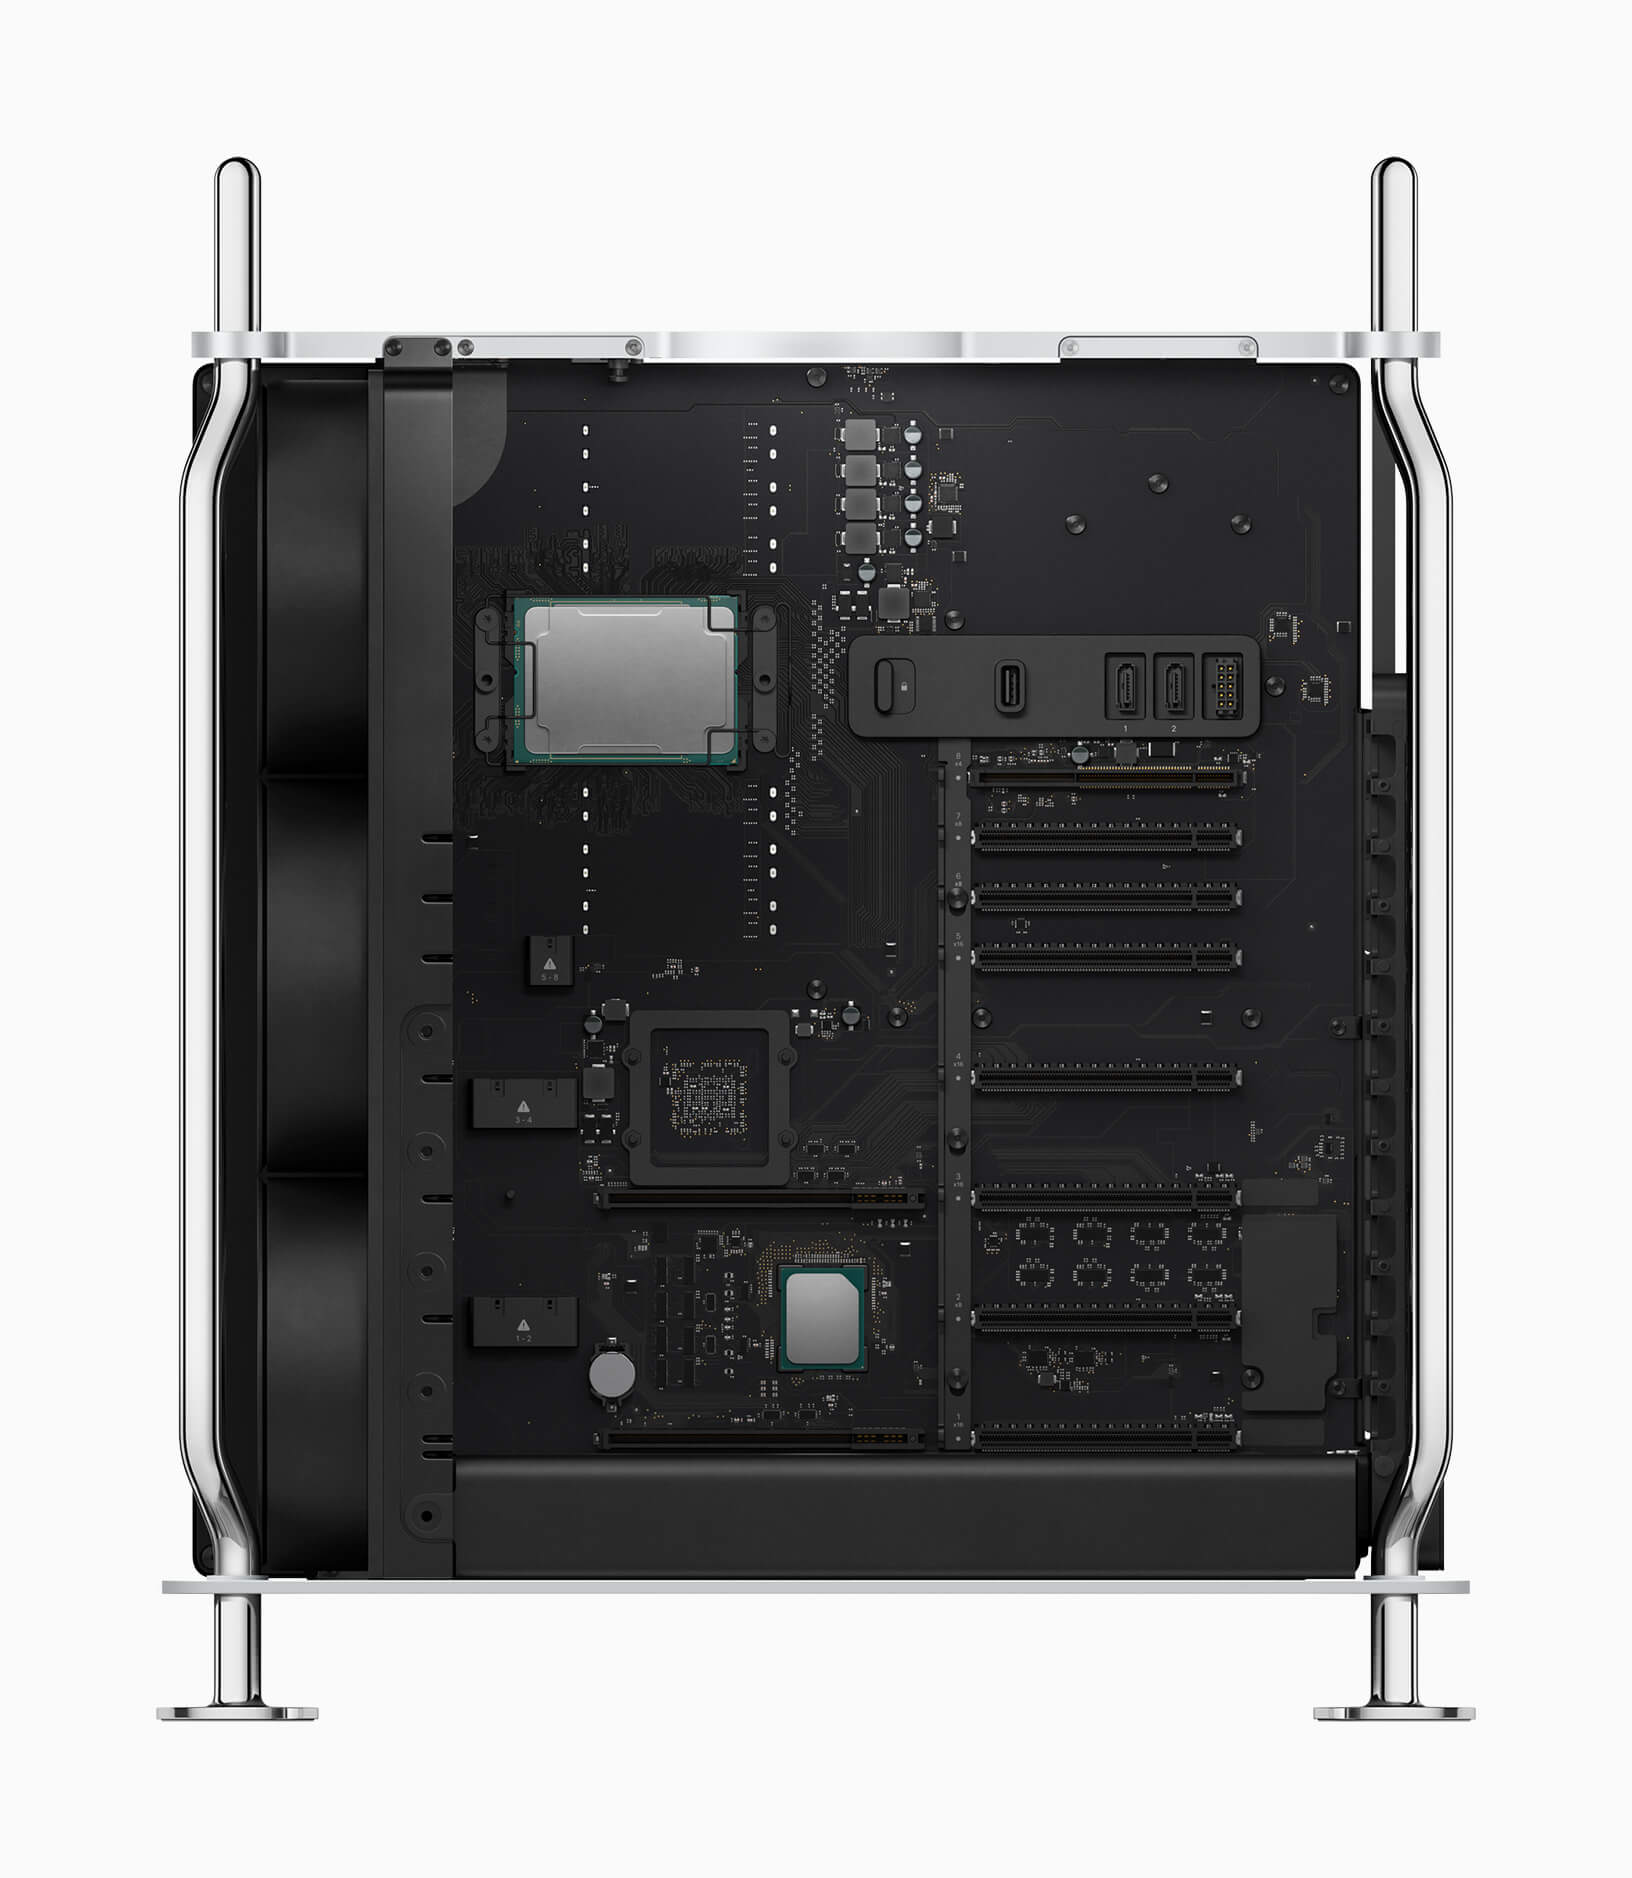 Mac Pro 2019 Innenleben - Apple